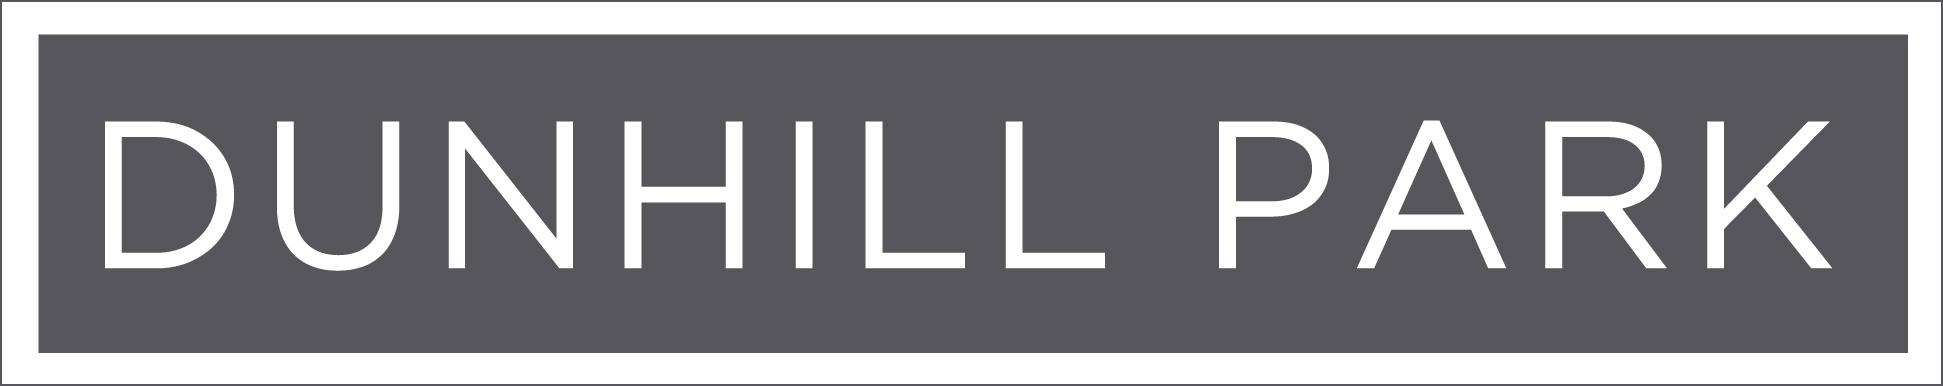 Dunhill Park - New Construction Builders | Novi Michigan